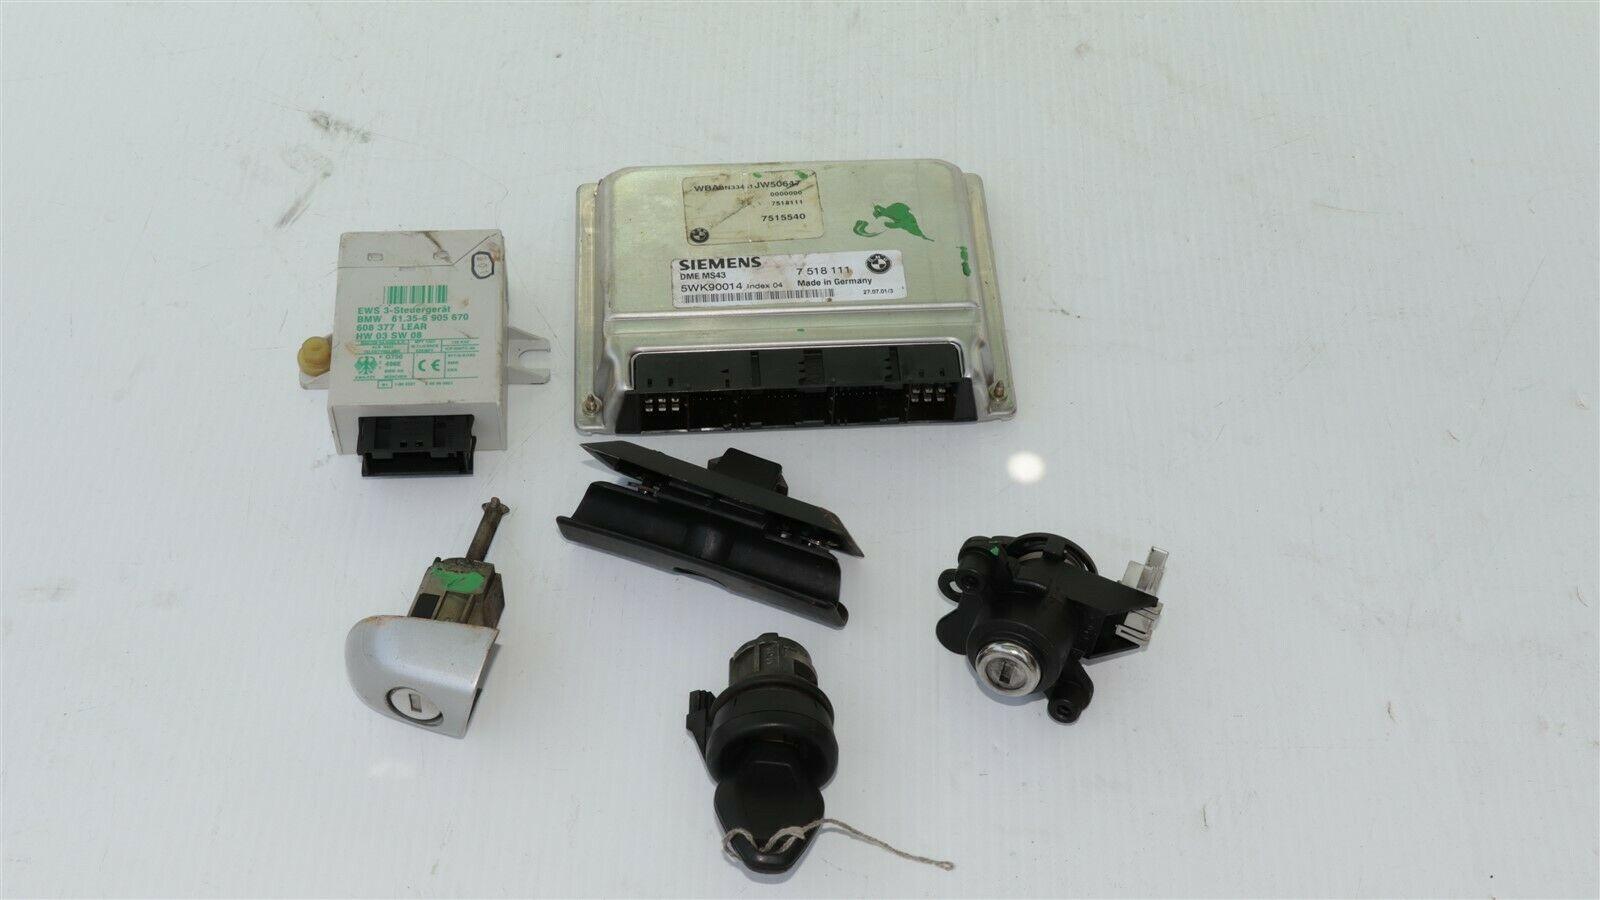 01 BMW 325Ci E46 MT 5sp M54 ECU ECM EWS DME Ignition Trunk Door GloveBox Key